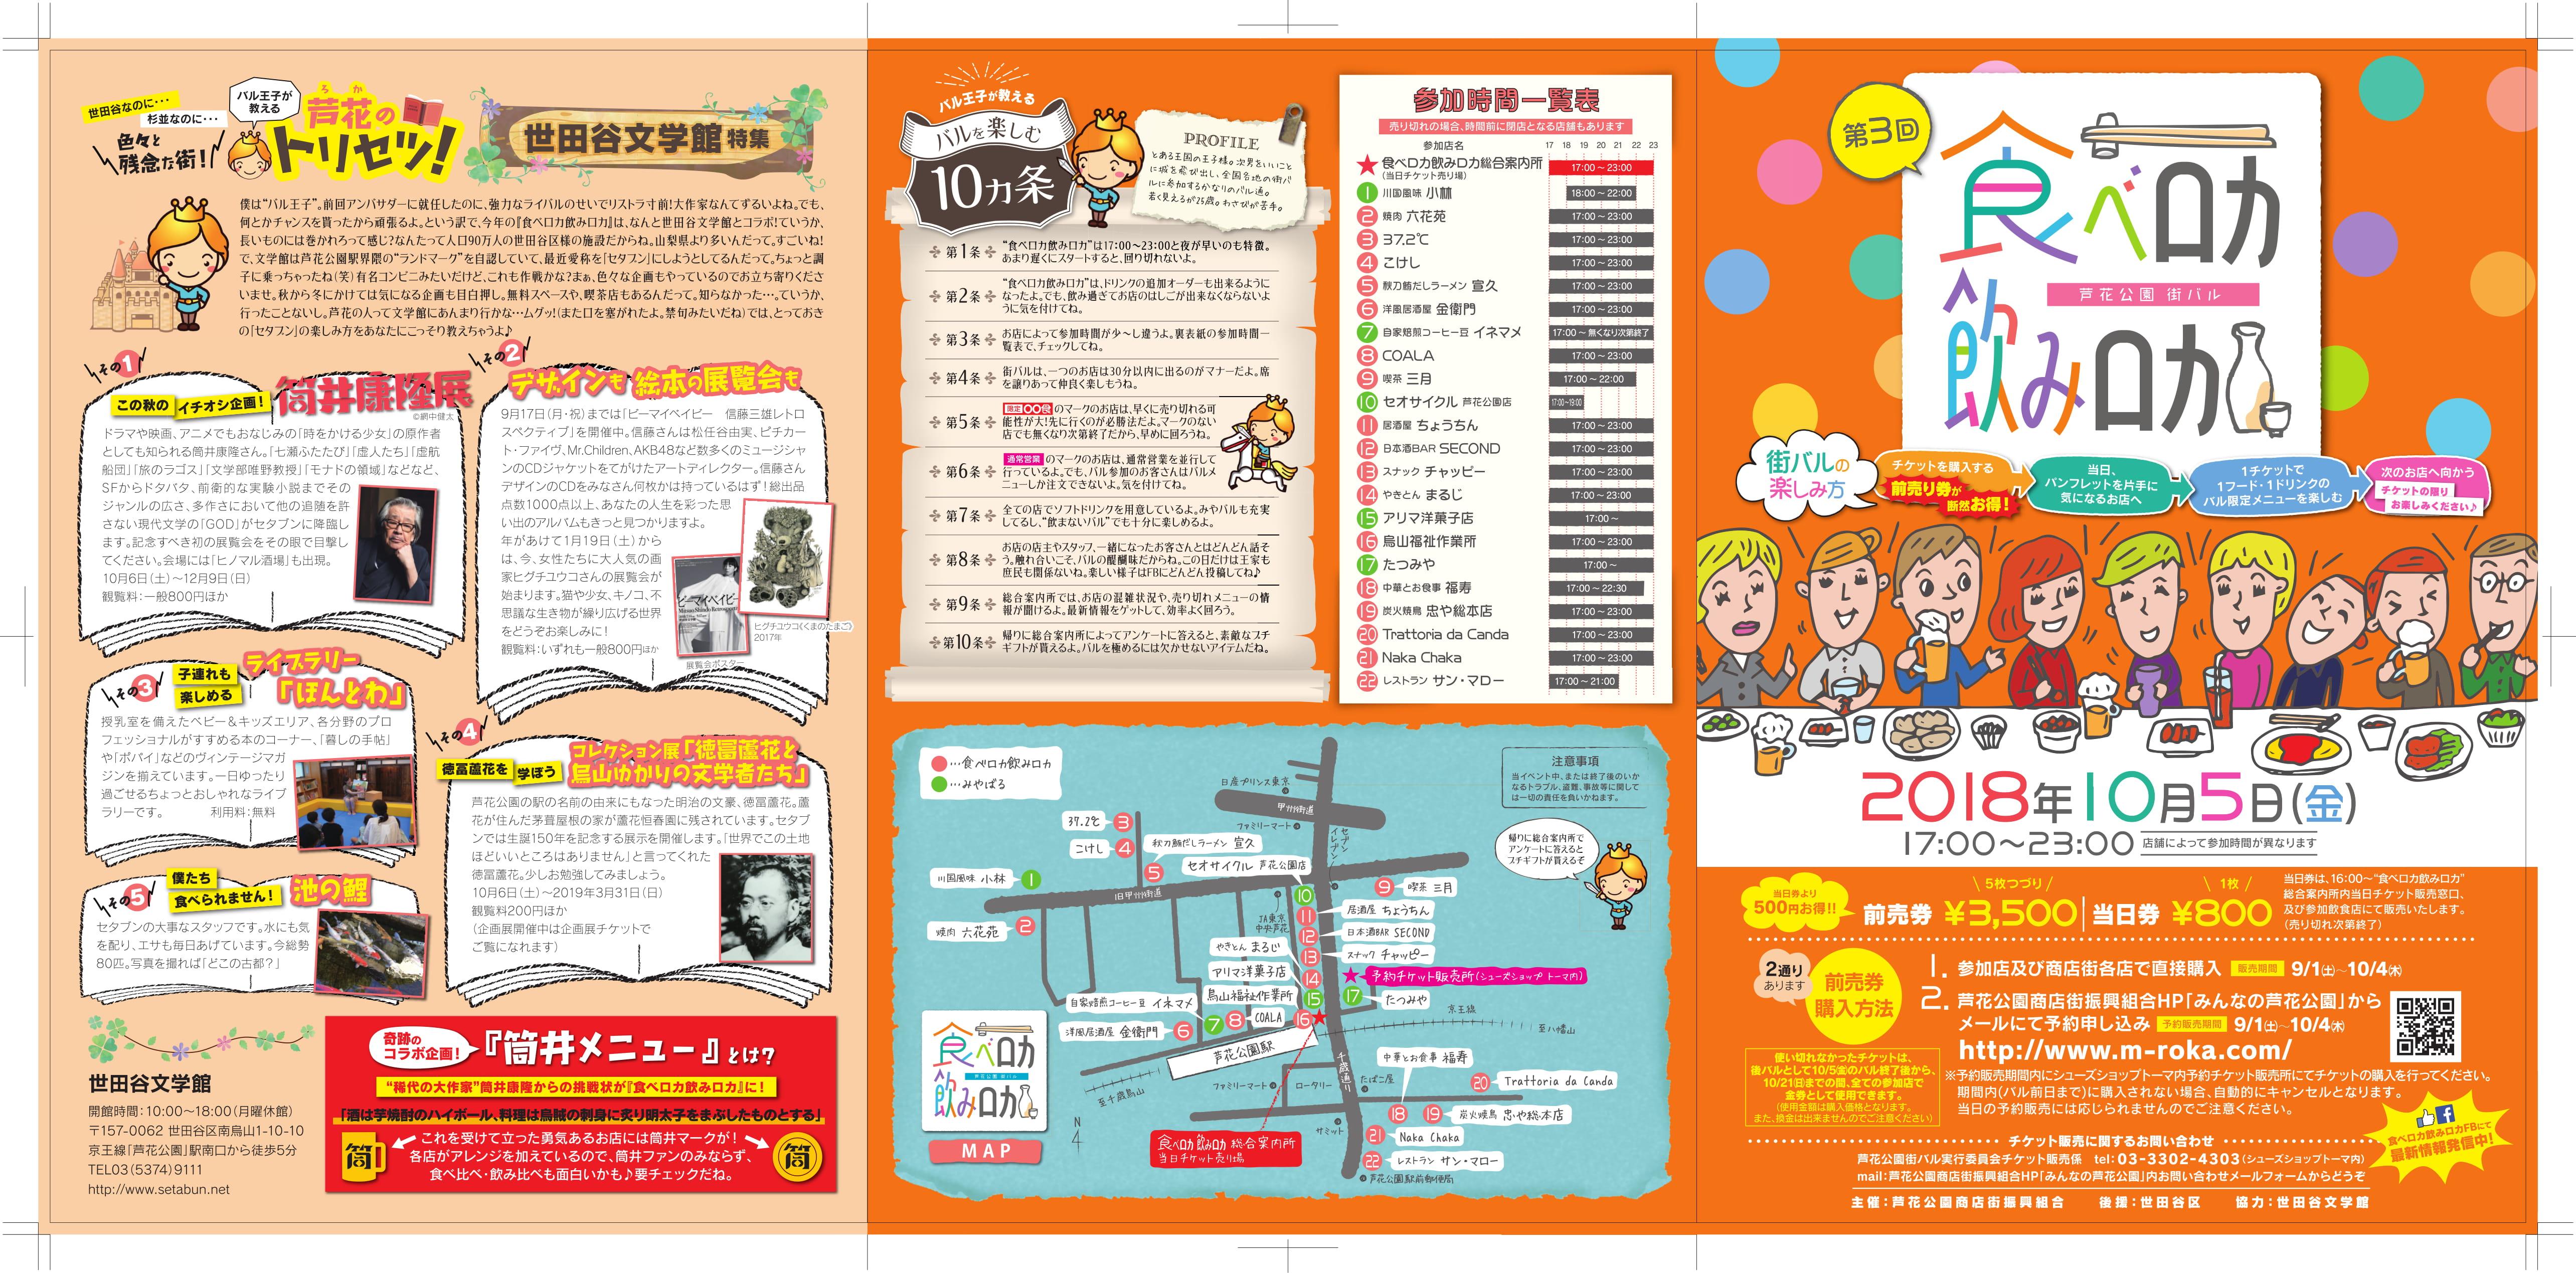 http://www.rokakoen.tokyo/topics_images/taberokanomiroka_3_main.jpg